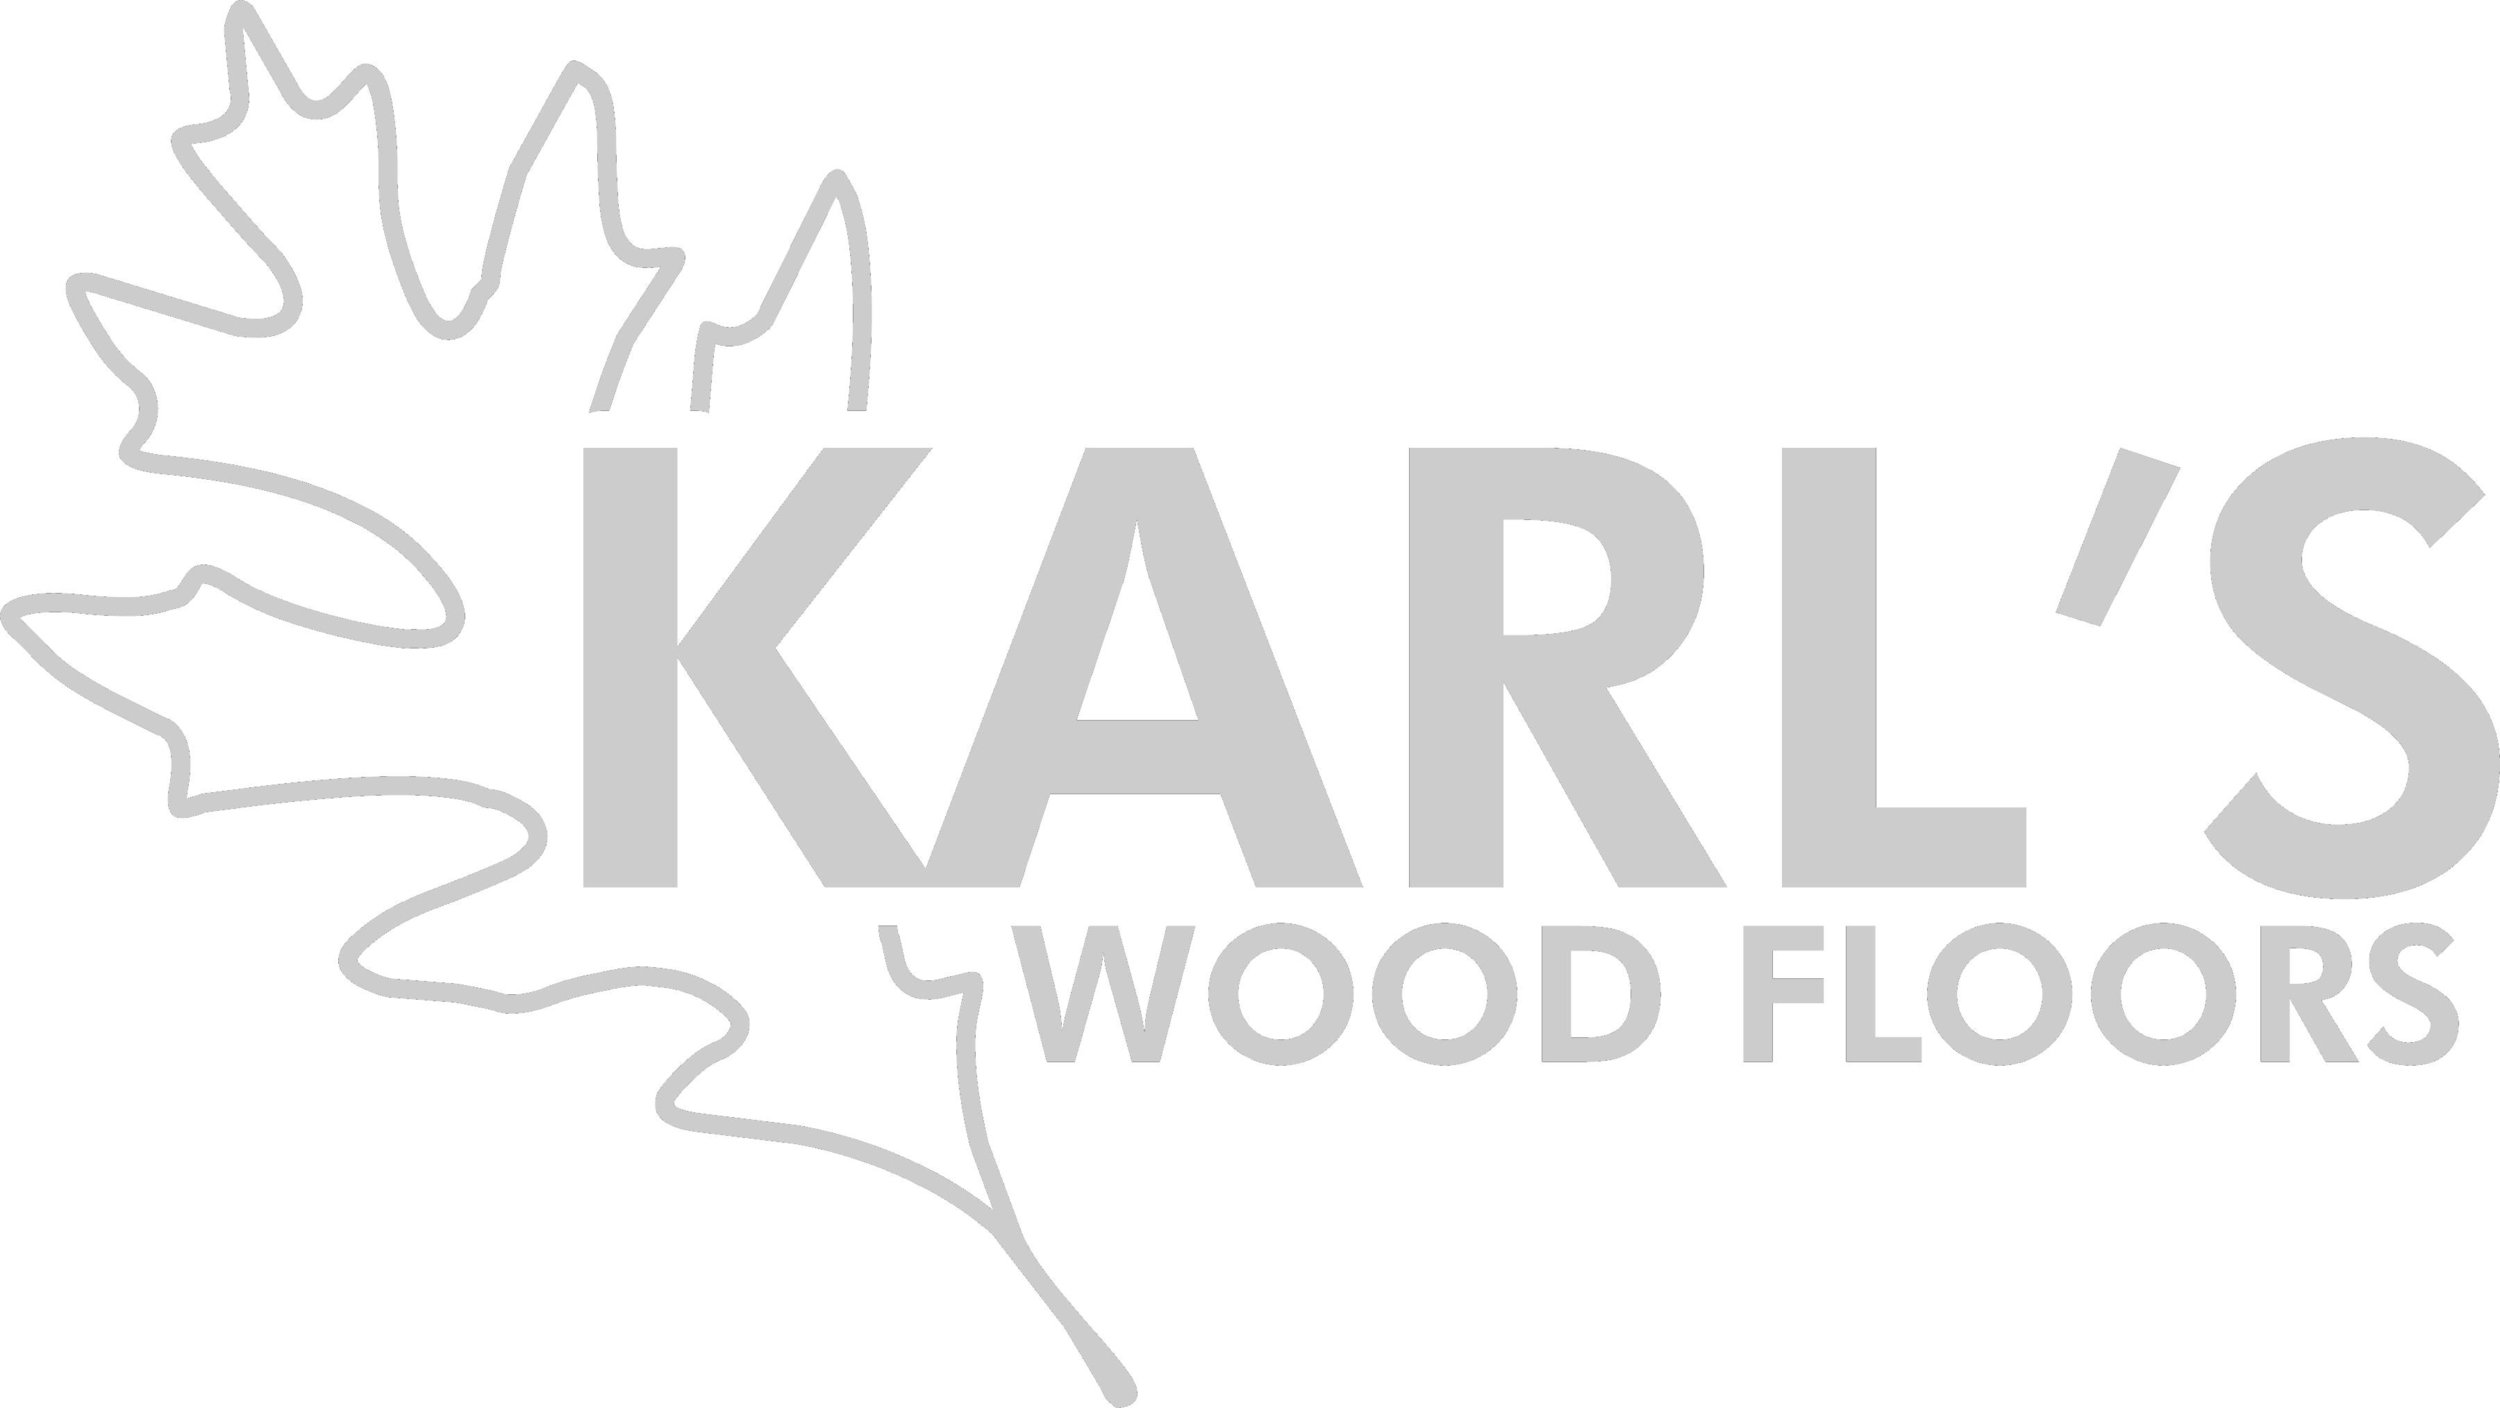 Karl's Wood Floors - LOGO.jpg